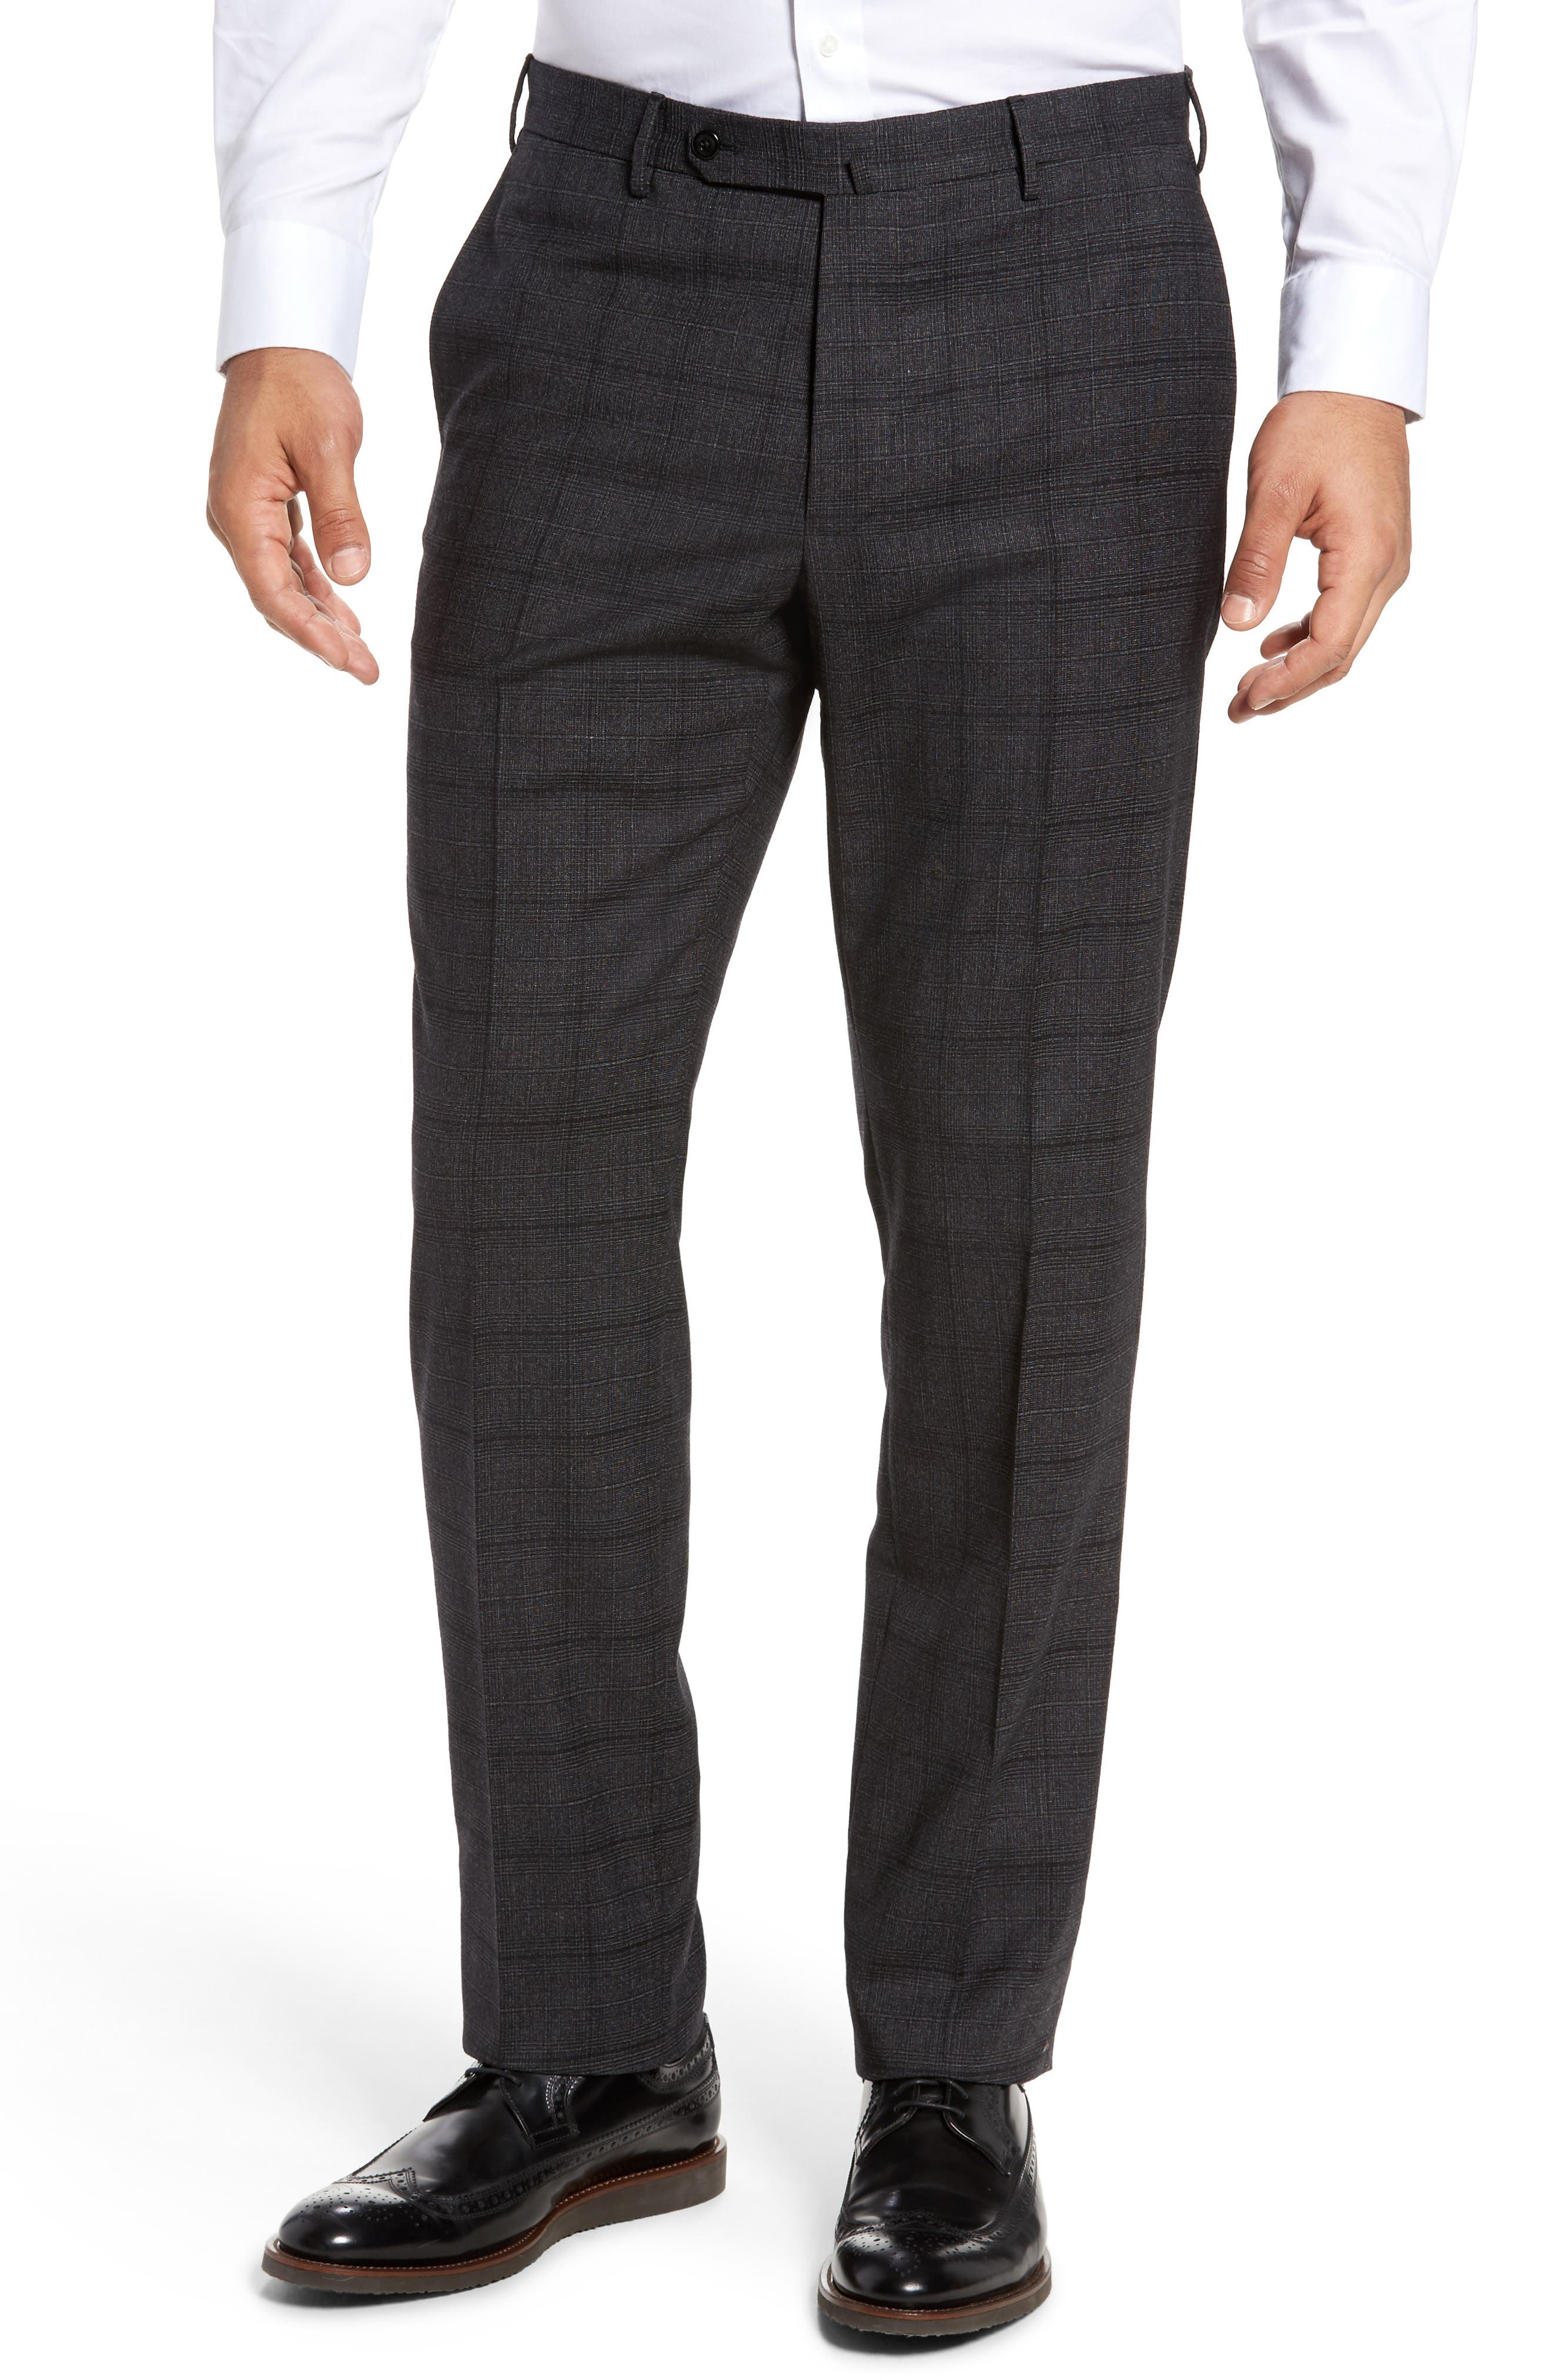 Benson Flat Front Trousers,                             Main thumbnail 1, color,                             015